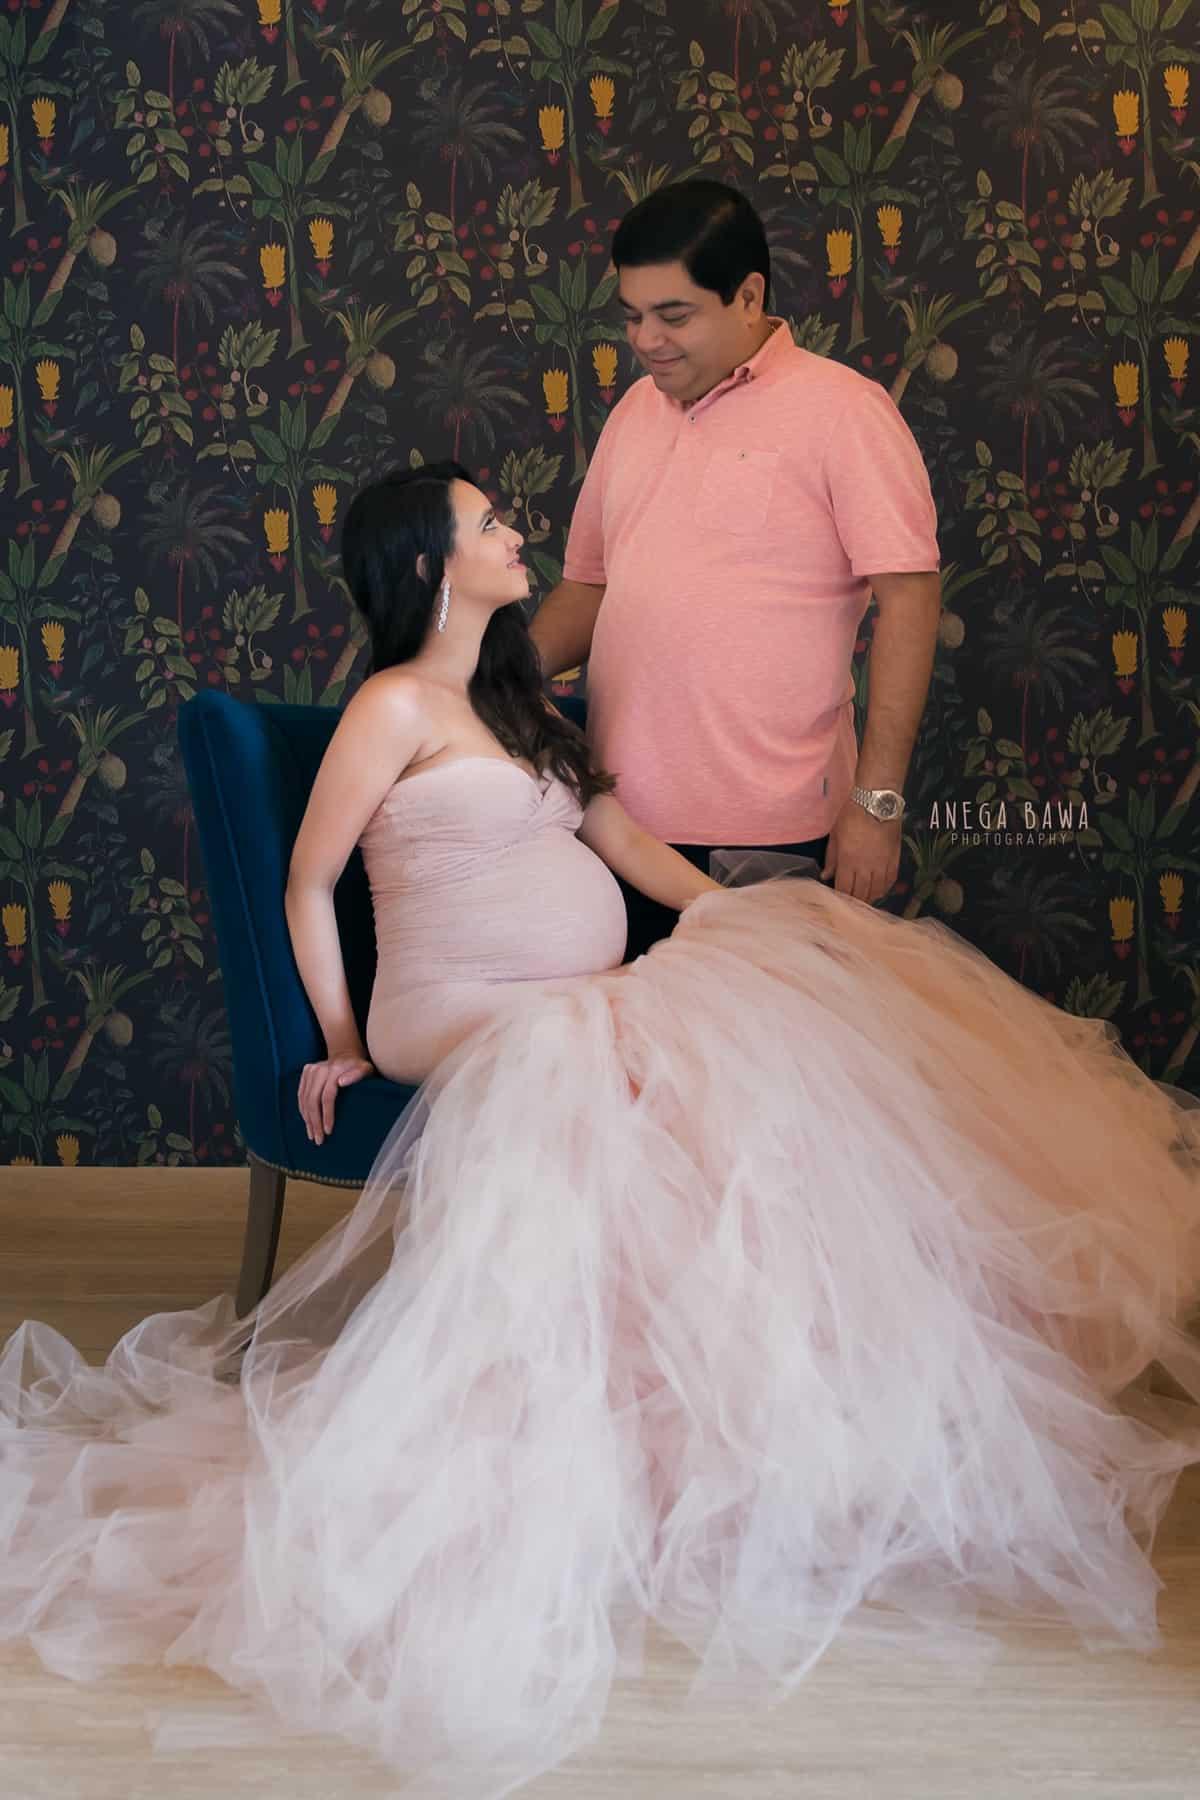 top maternity photography delhi gurgaon pink dress tropical background anega bawa